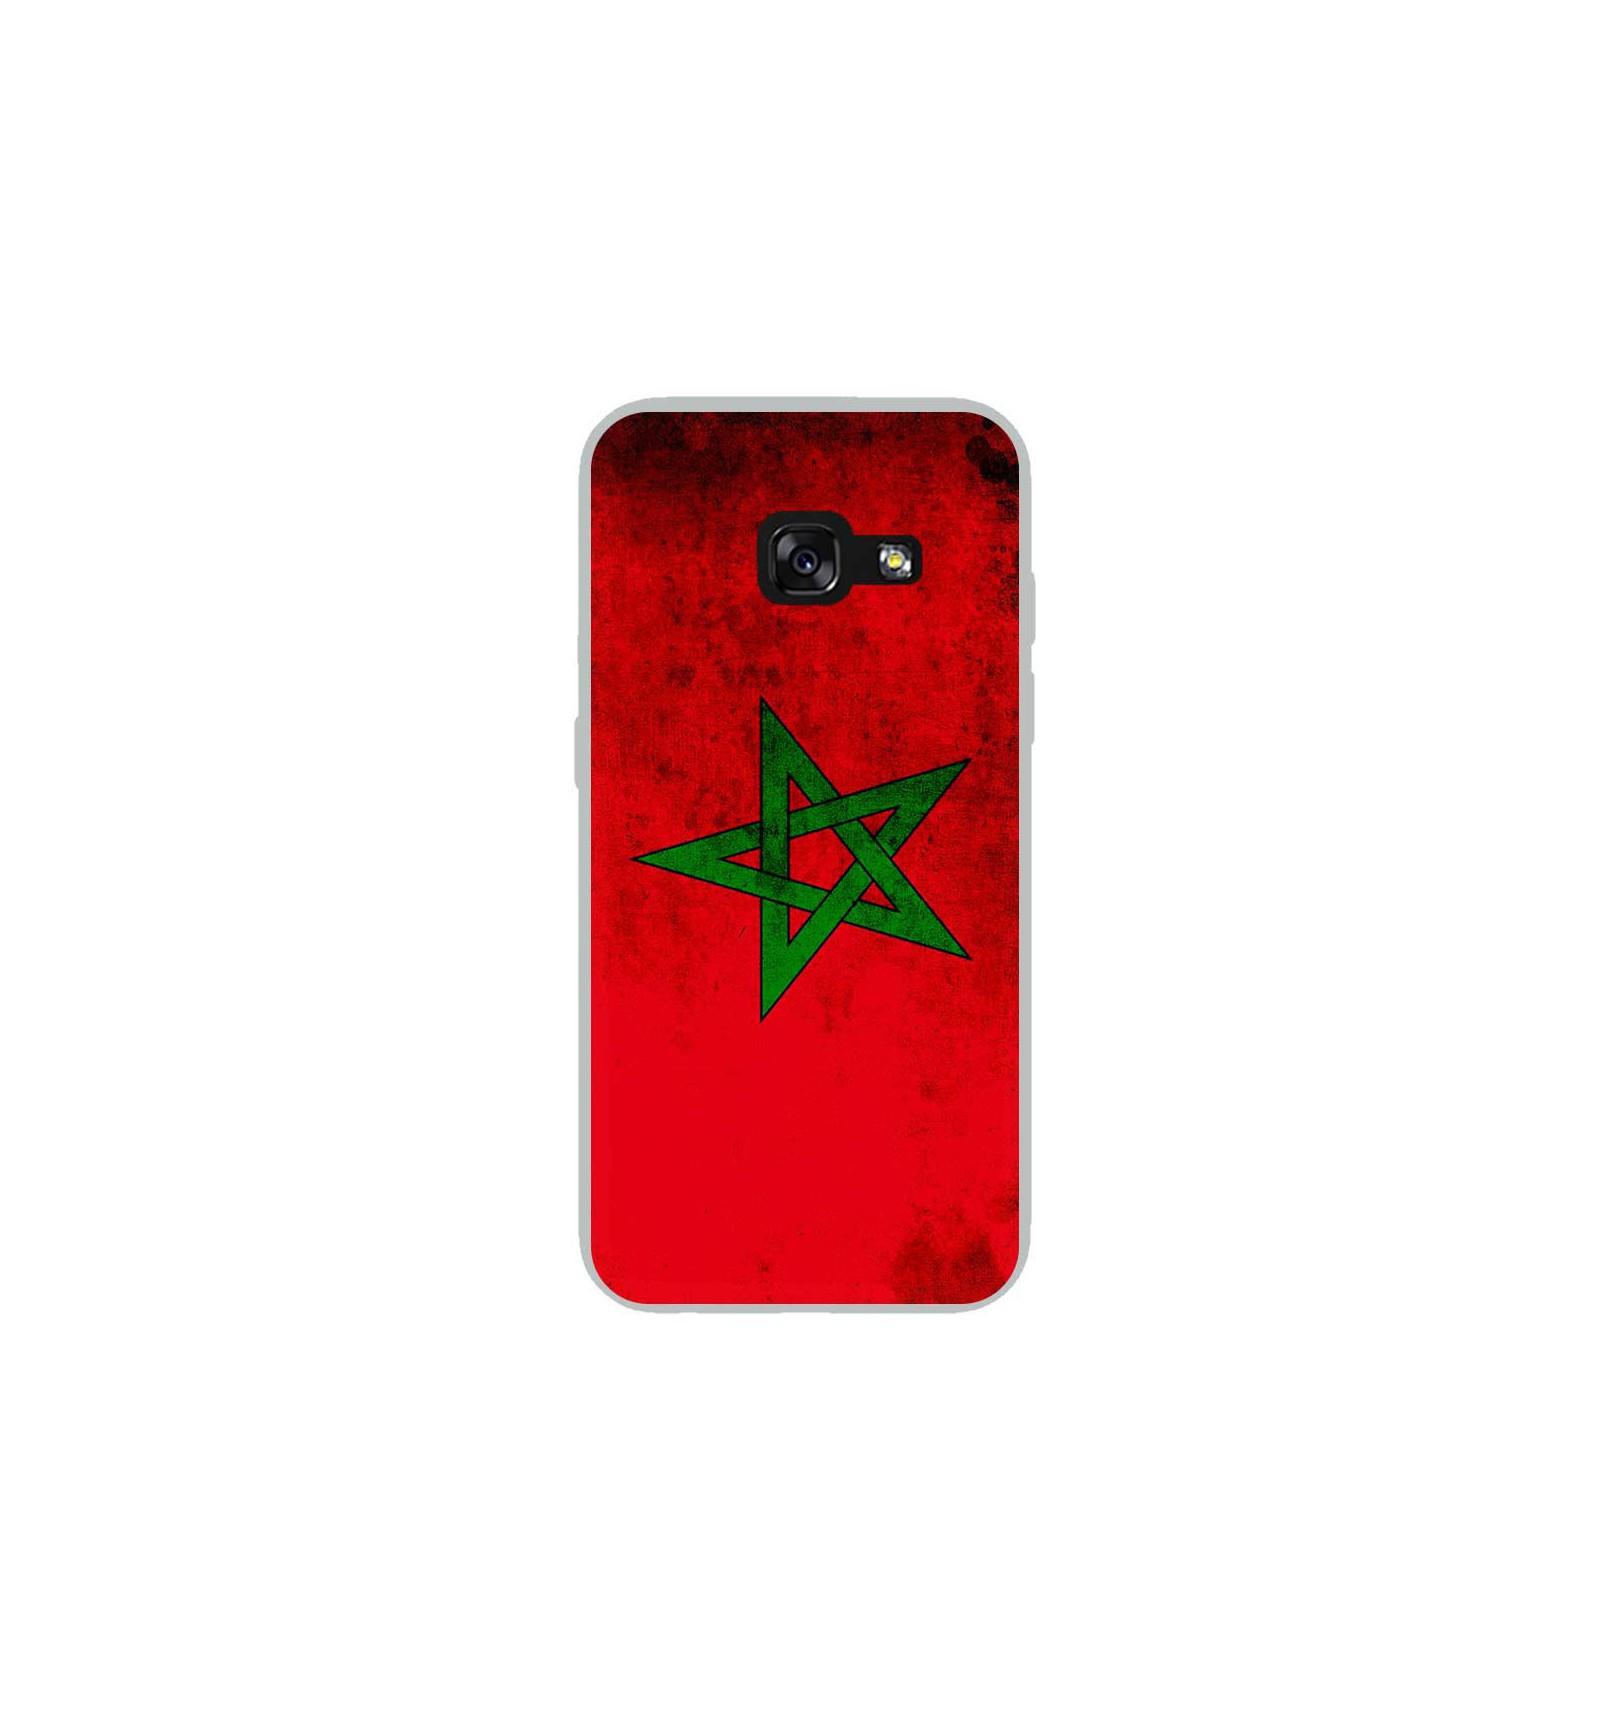 coque samsung a5 2017 maroc